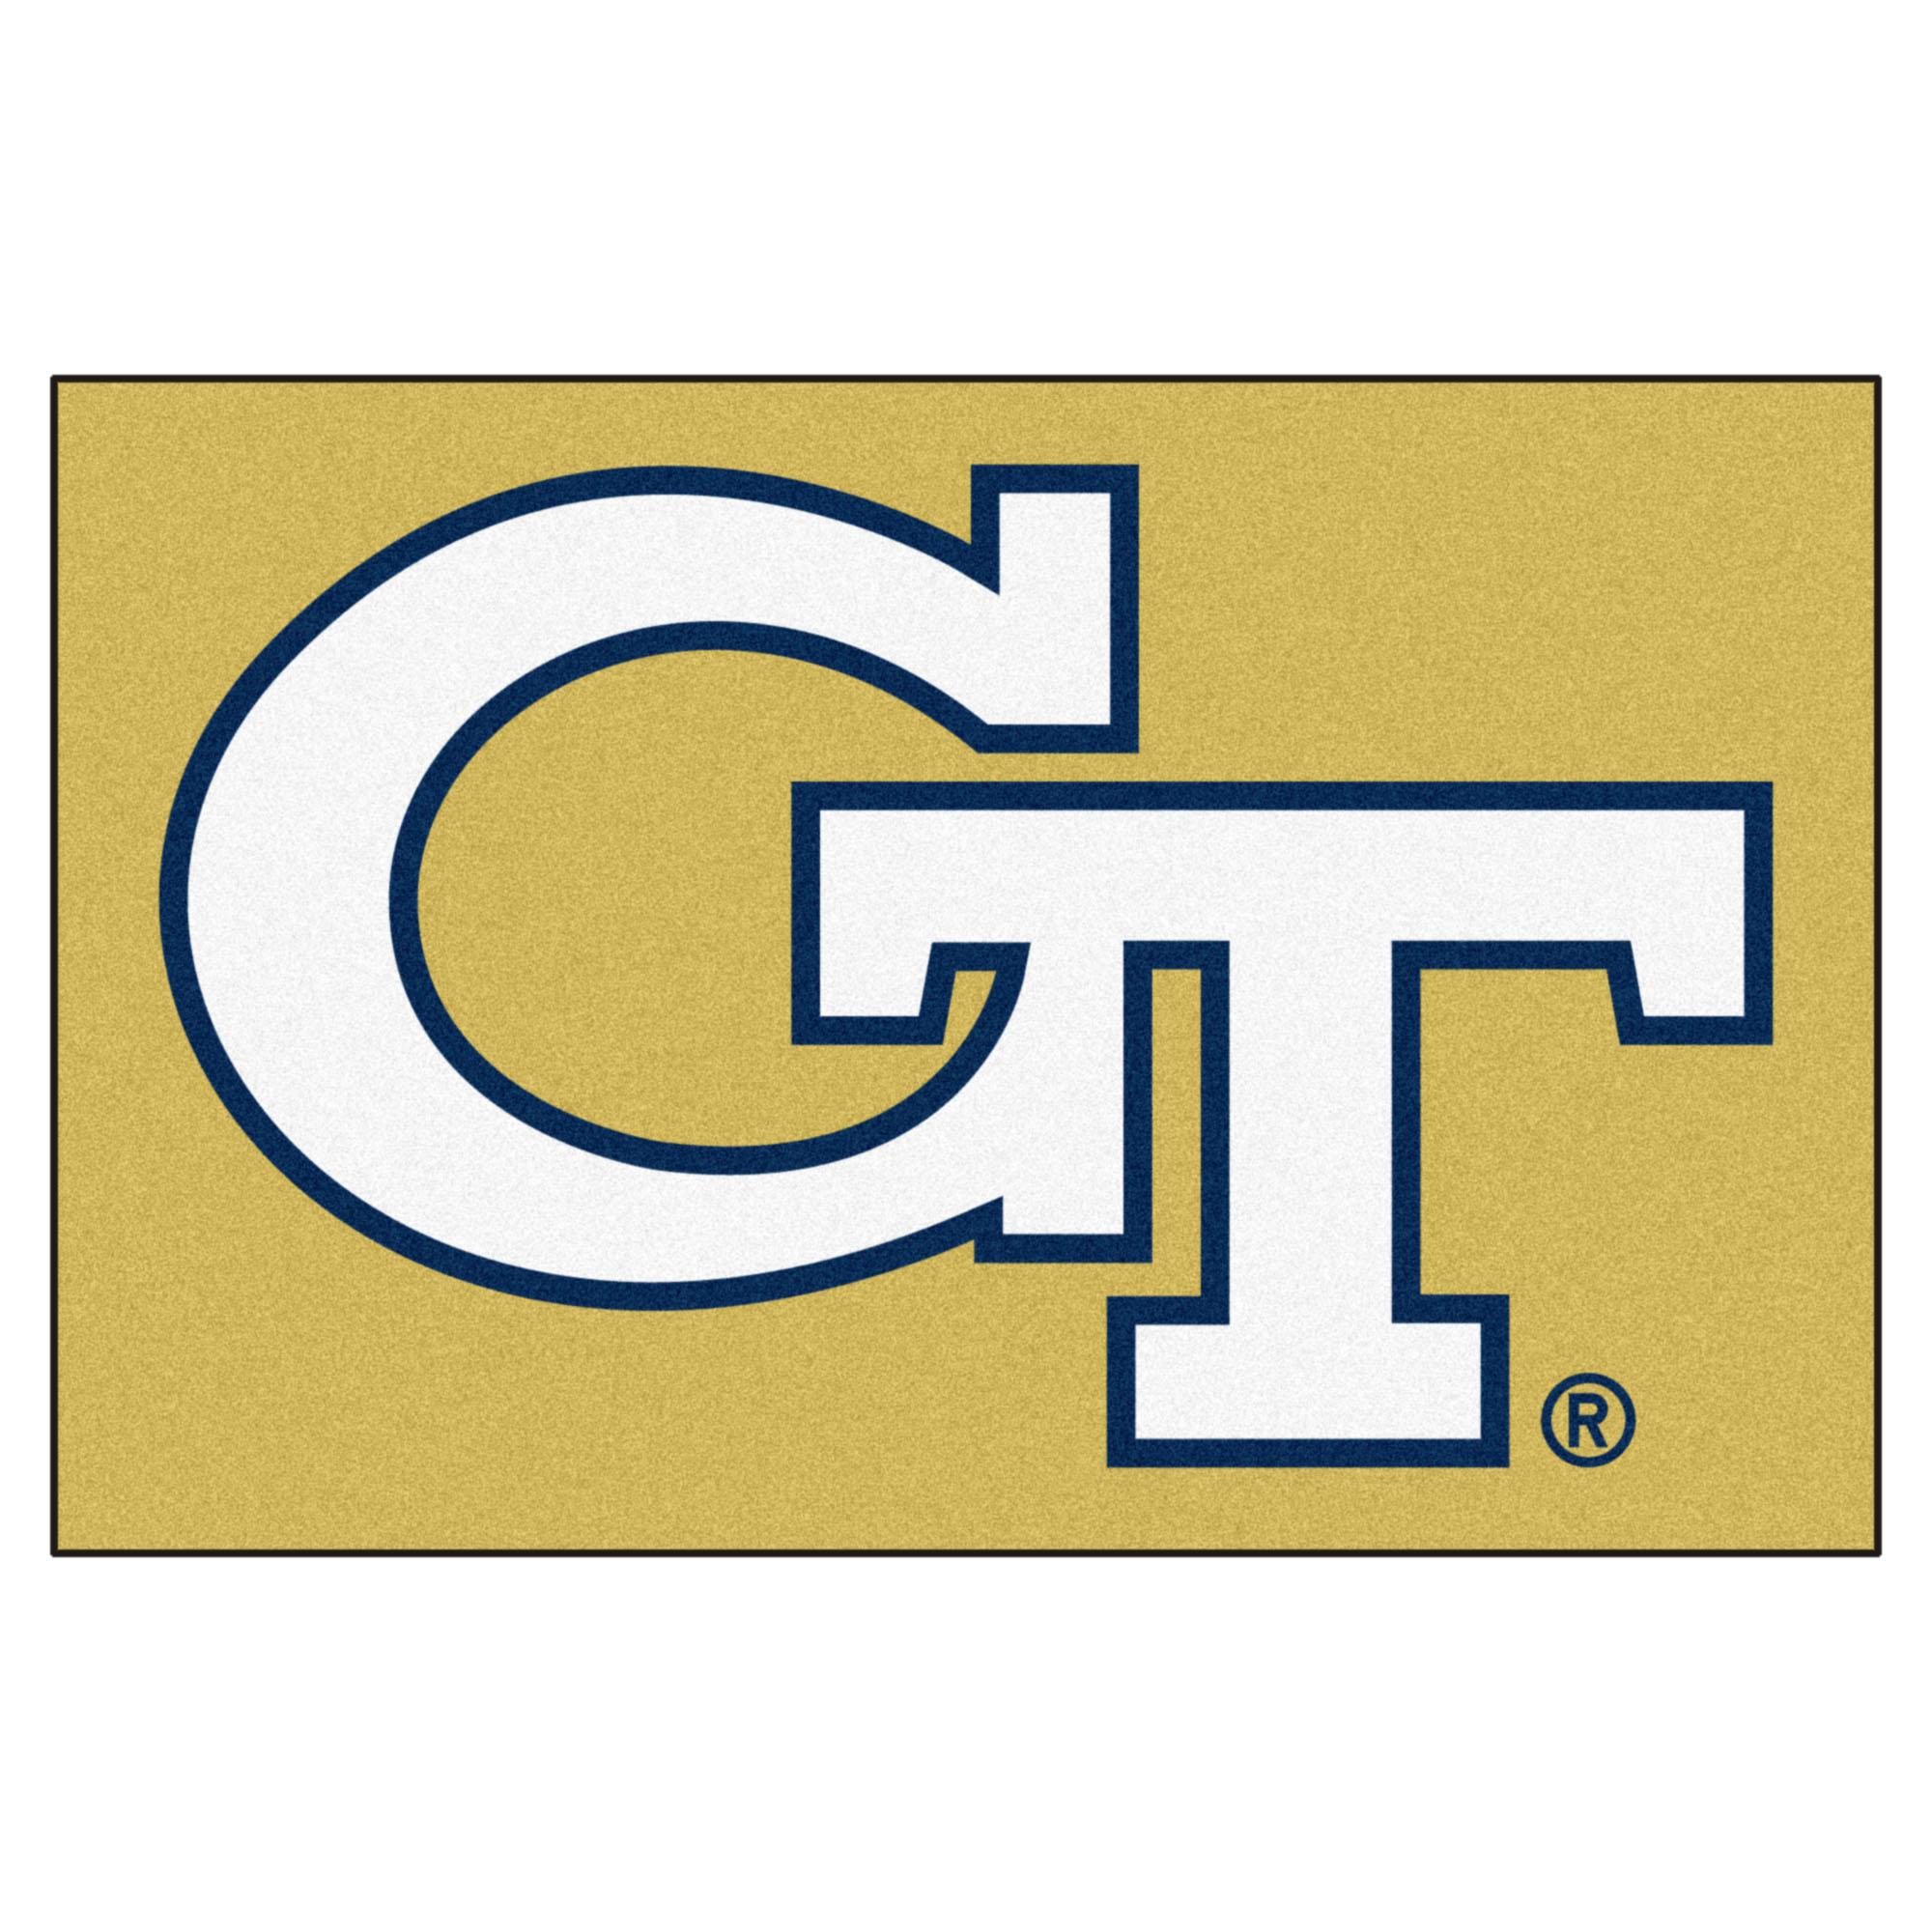 NCAA Georgia Tech Yellow Jackets, Ramblin' Wreck Starter Mat Rectangular Area Rug